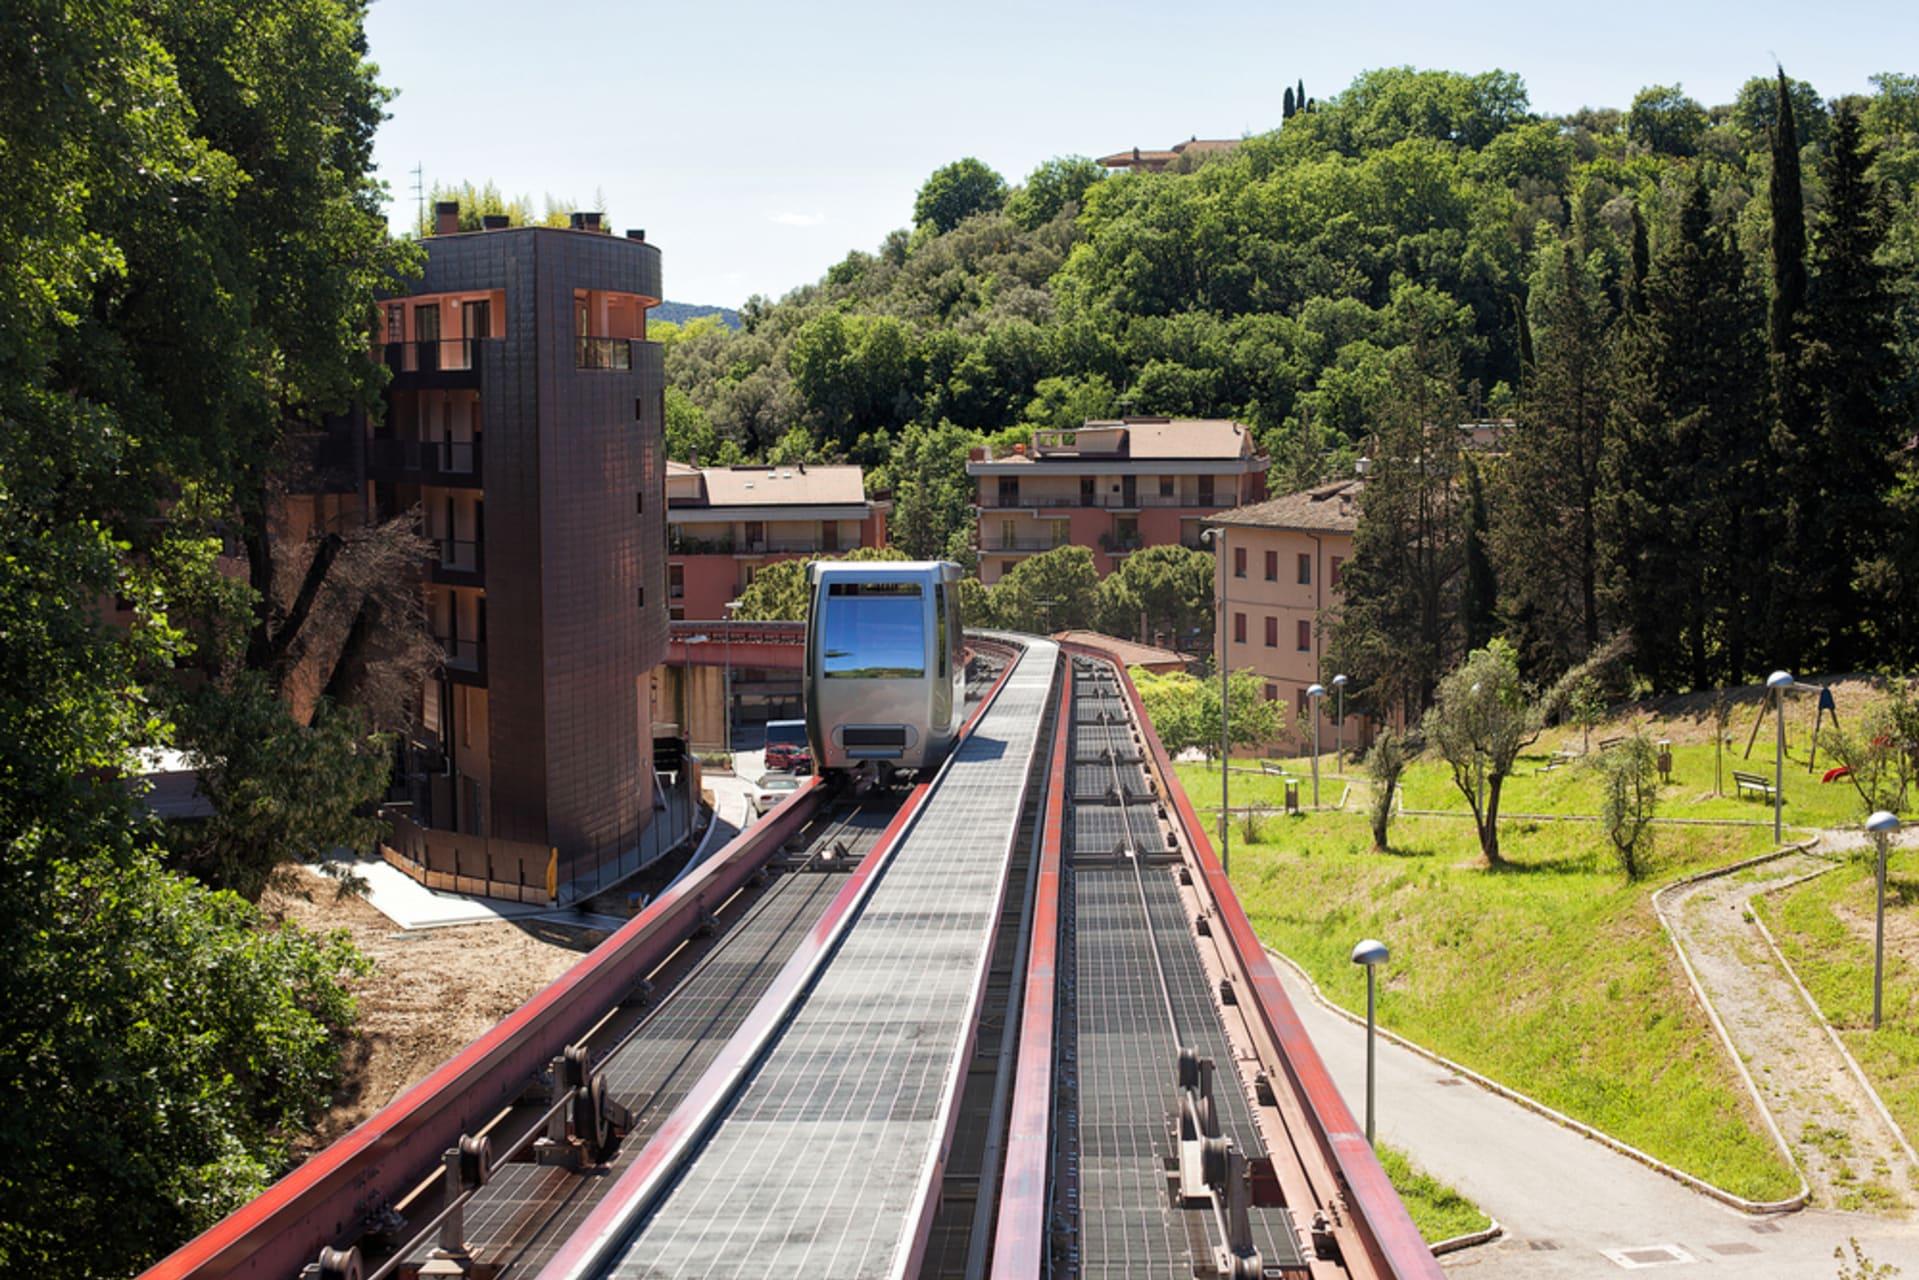 Perugia - Riding the Minimetrò up to the Chocolate Hill